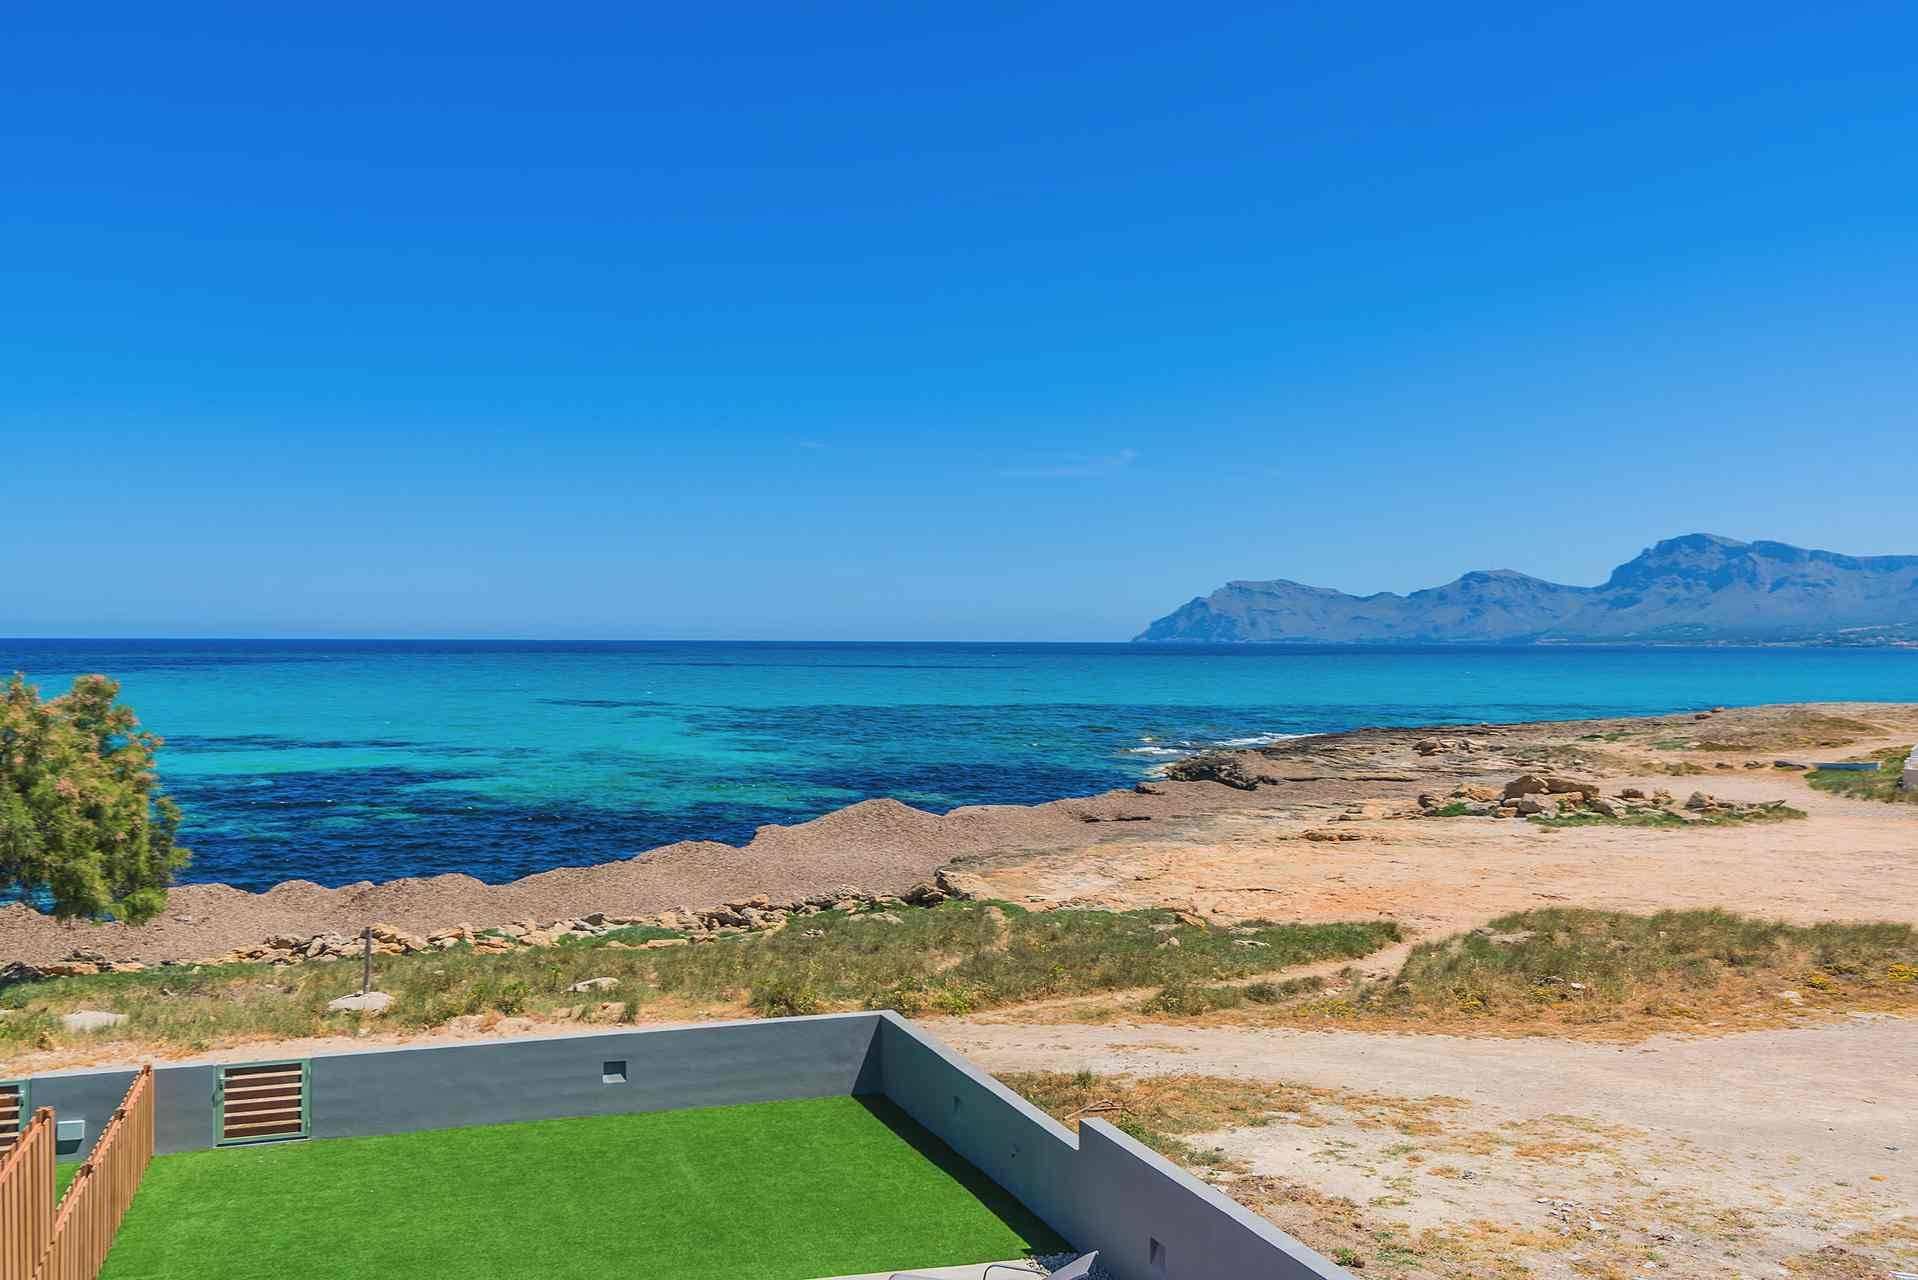 01-316 Chalet mit Meerblick Mallorca Norden Bild 3